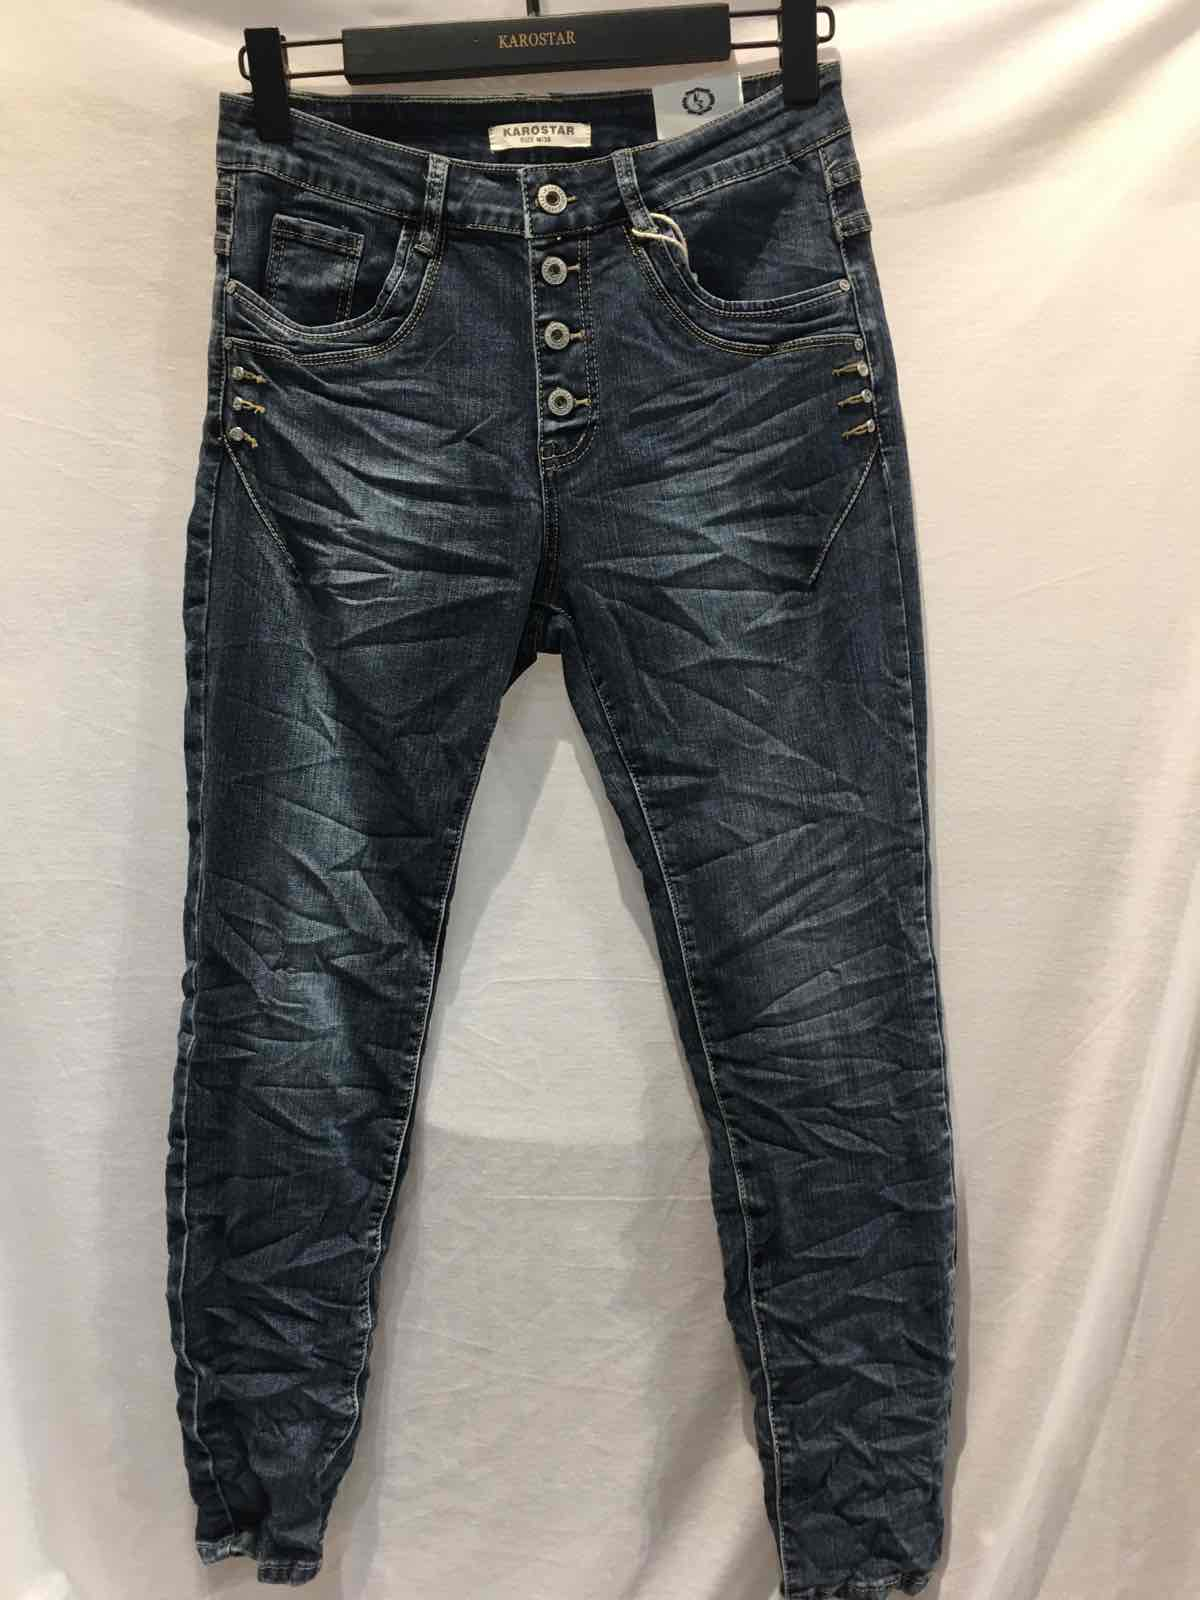 Karostar Jeans Denim Collection